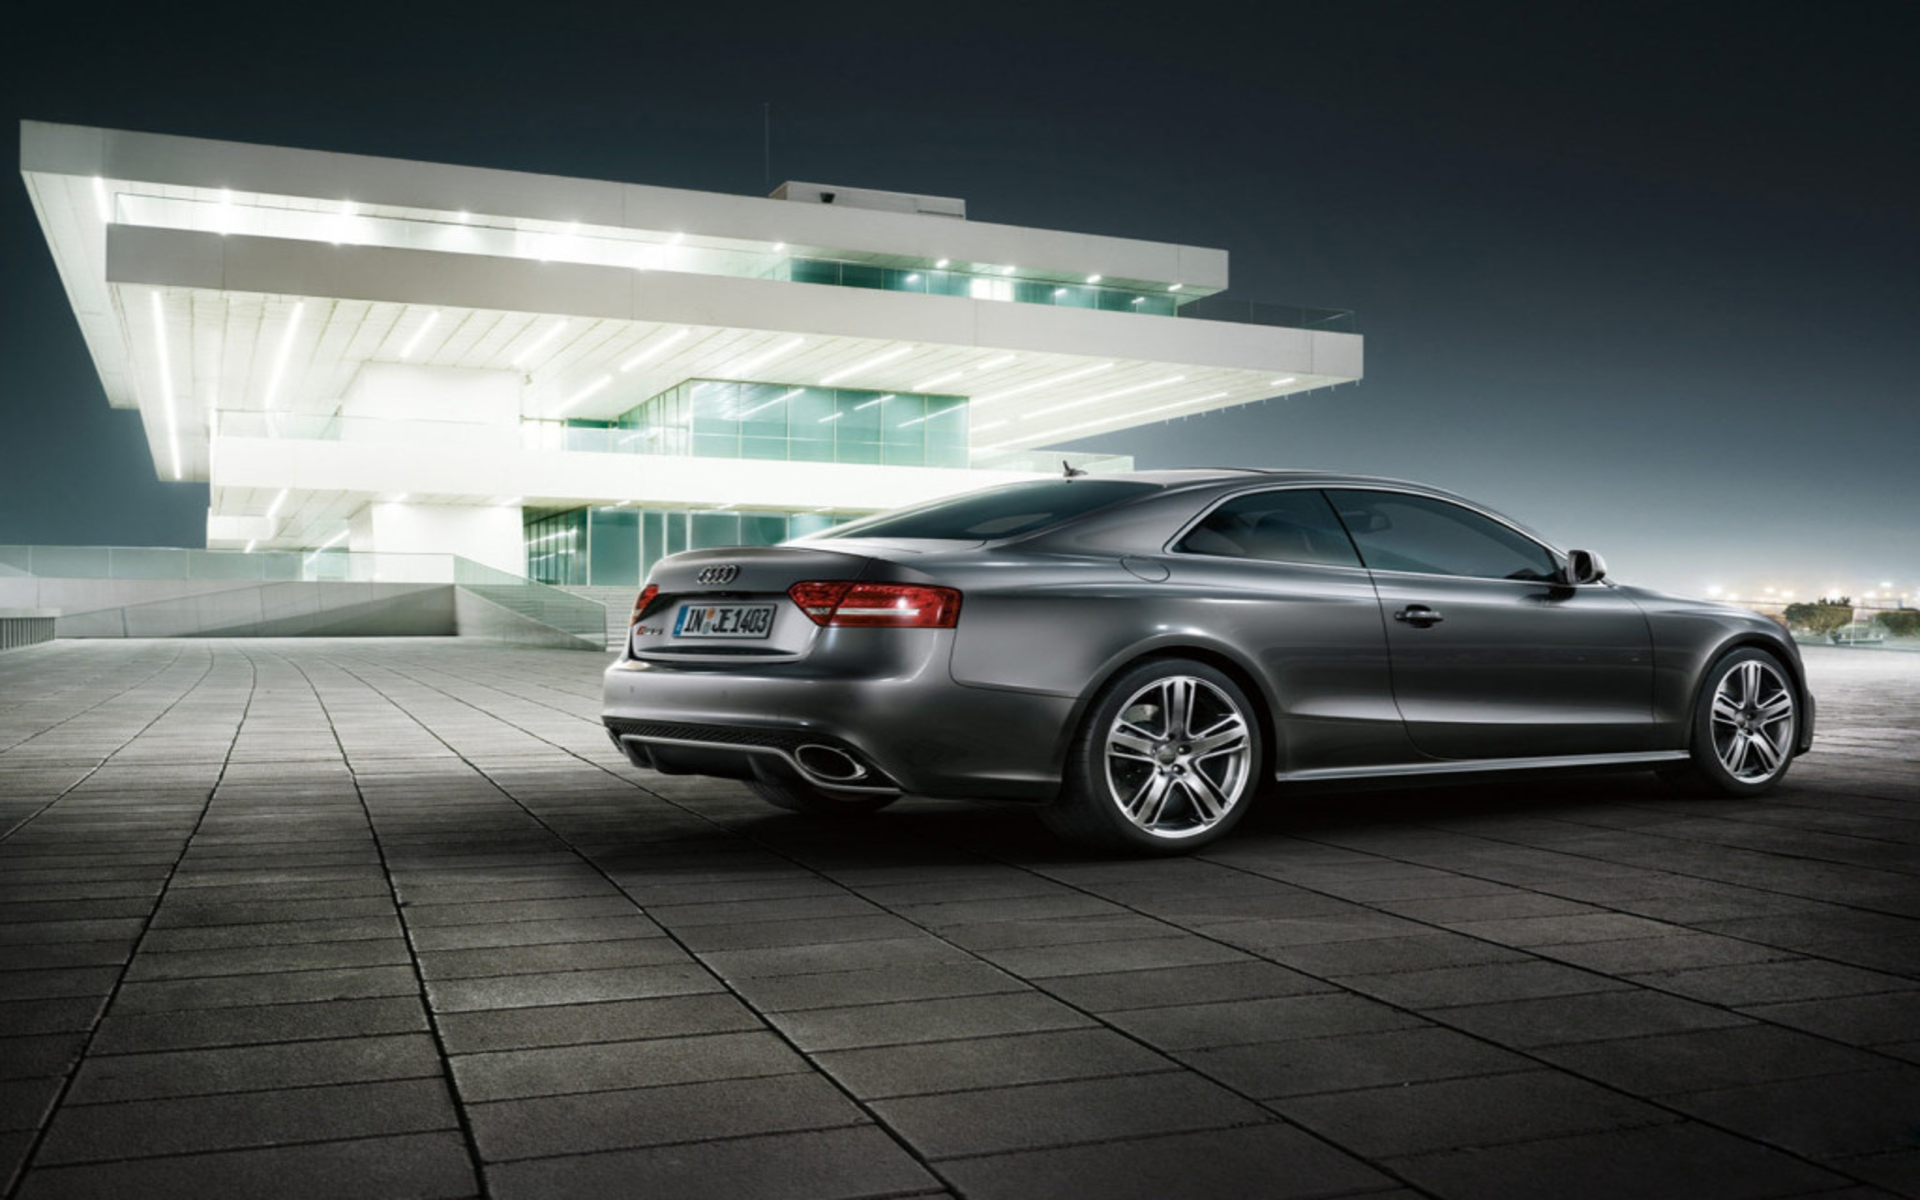 Audi RS5 ws free picture in album audi HD Wallpaper